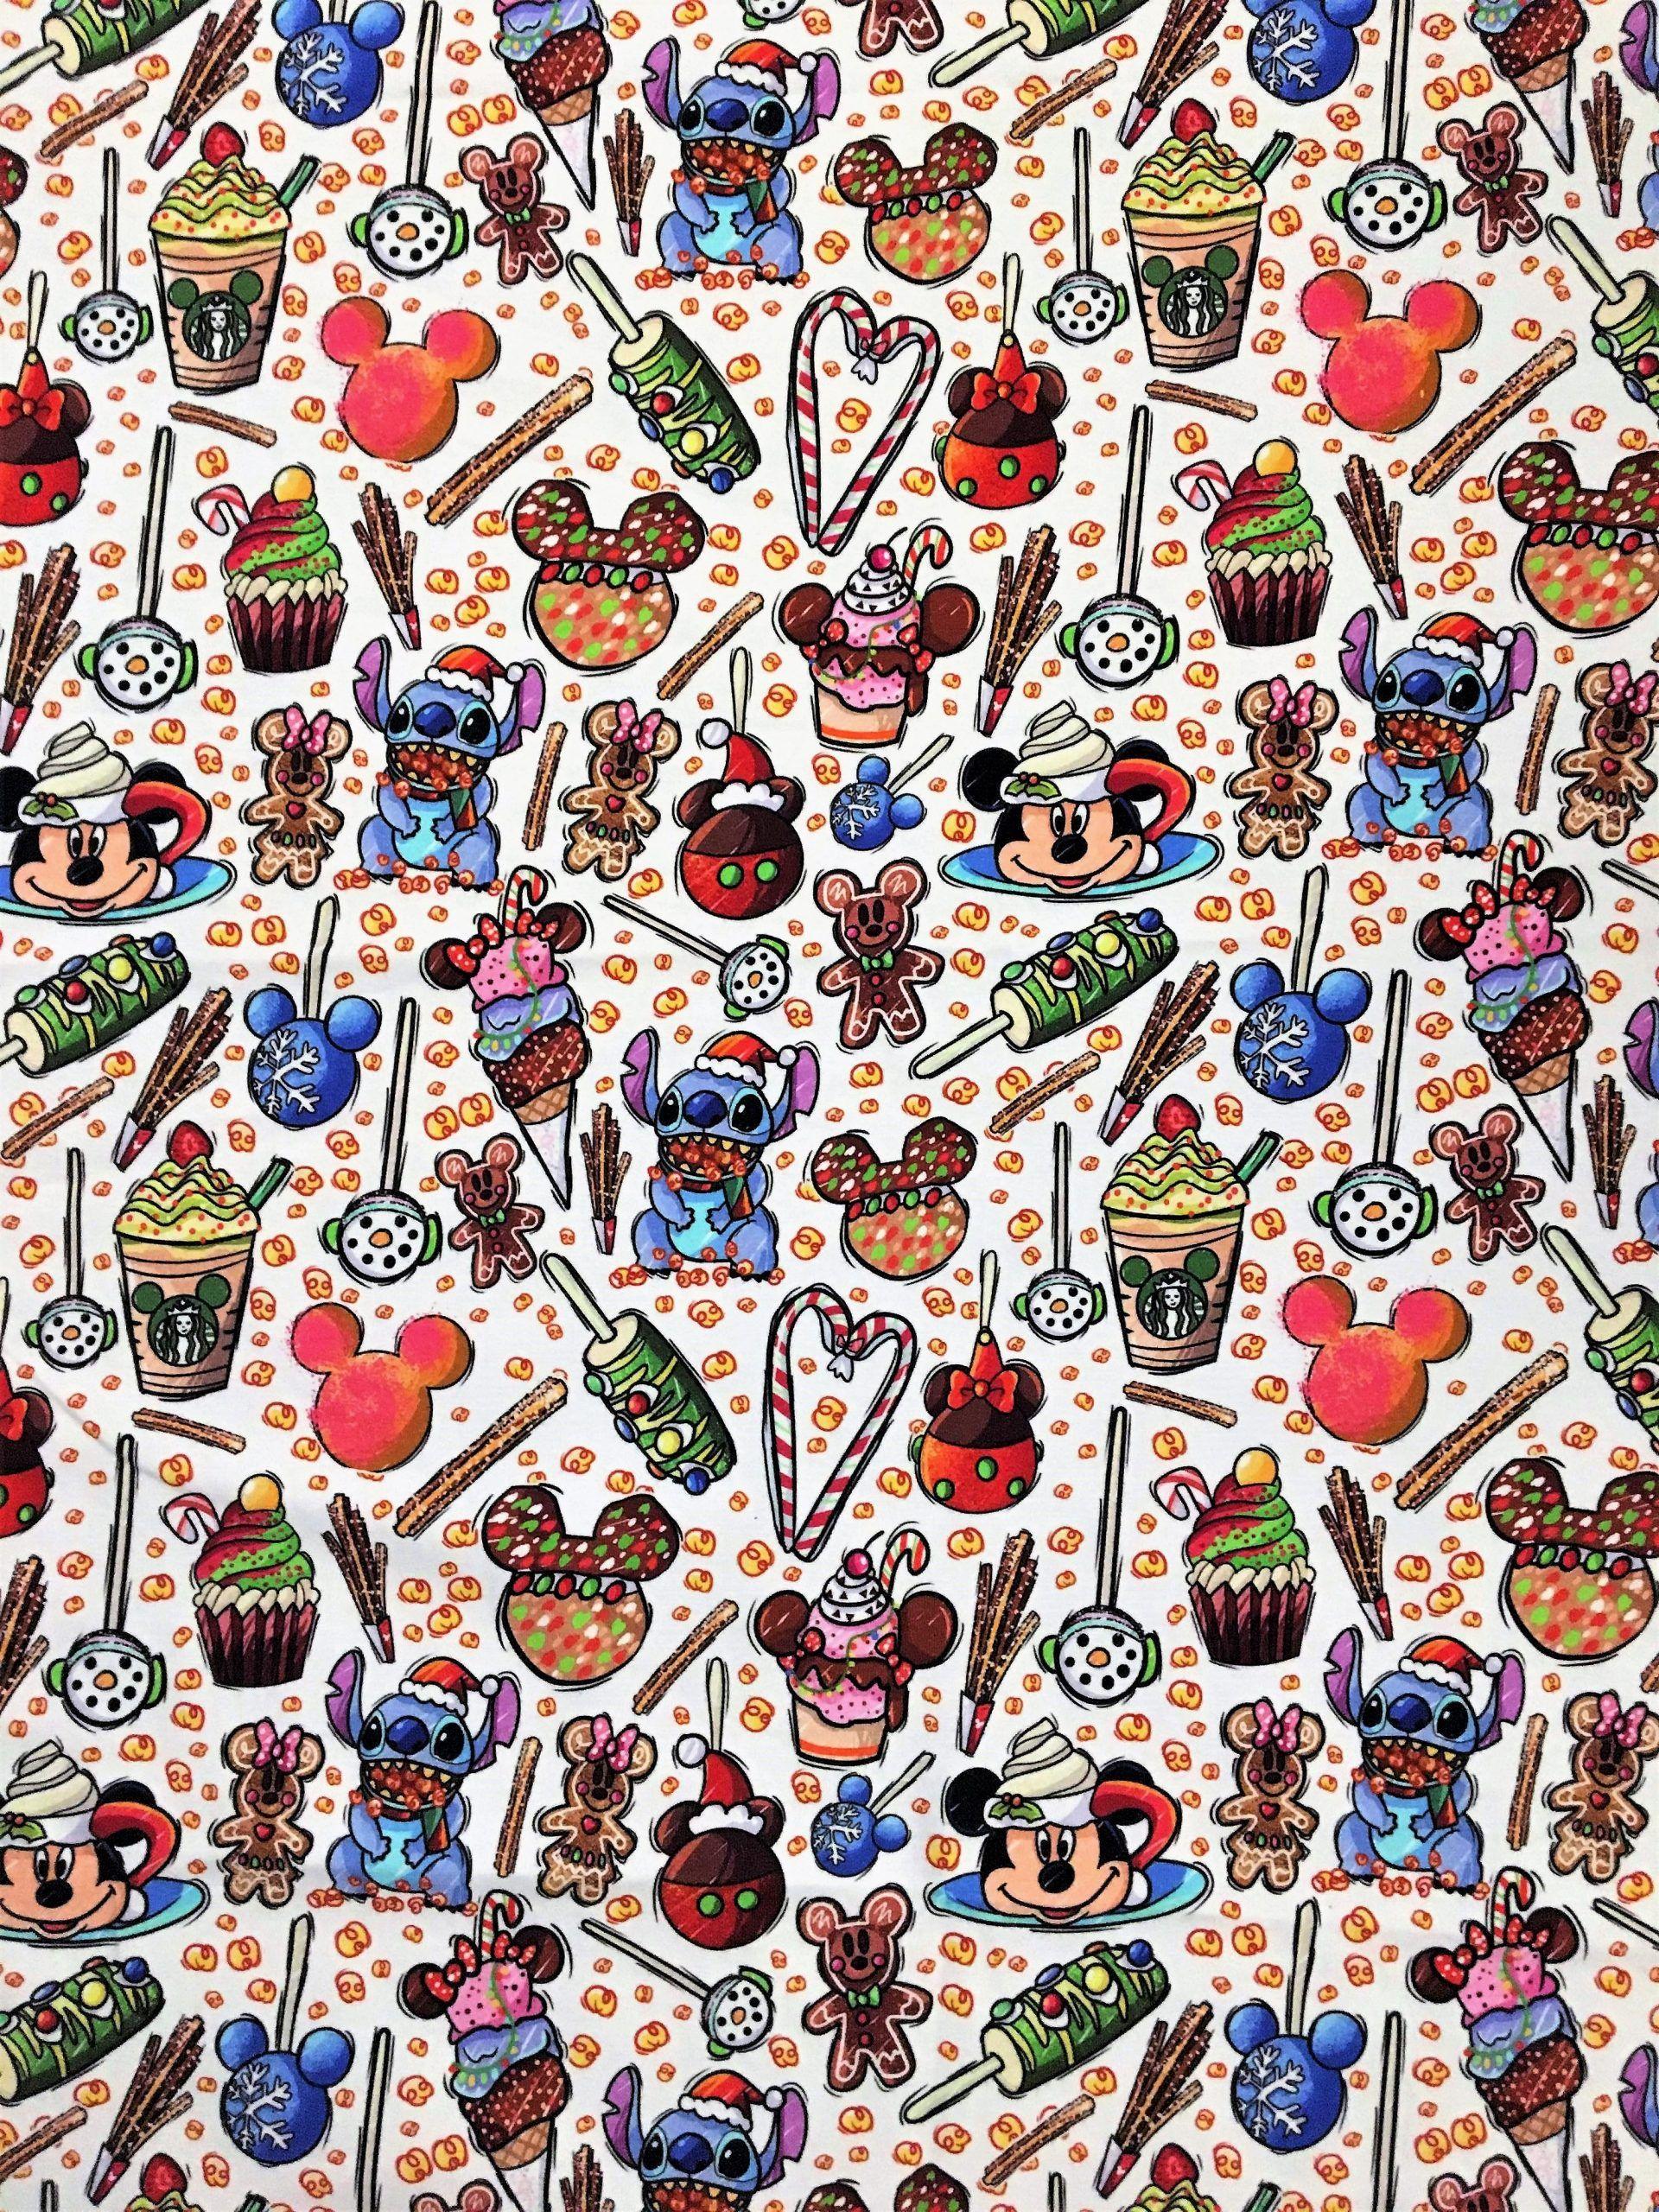 Disney Christmas Wallpaper Fabric In 2020 Wallpaper Iphone